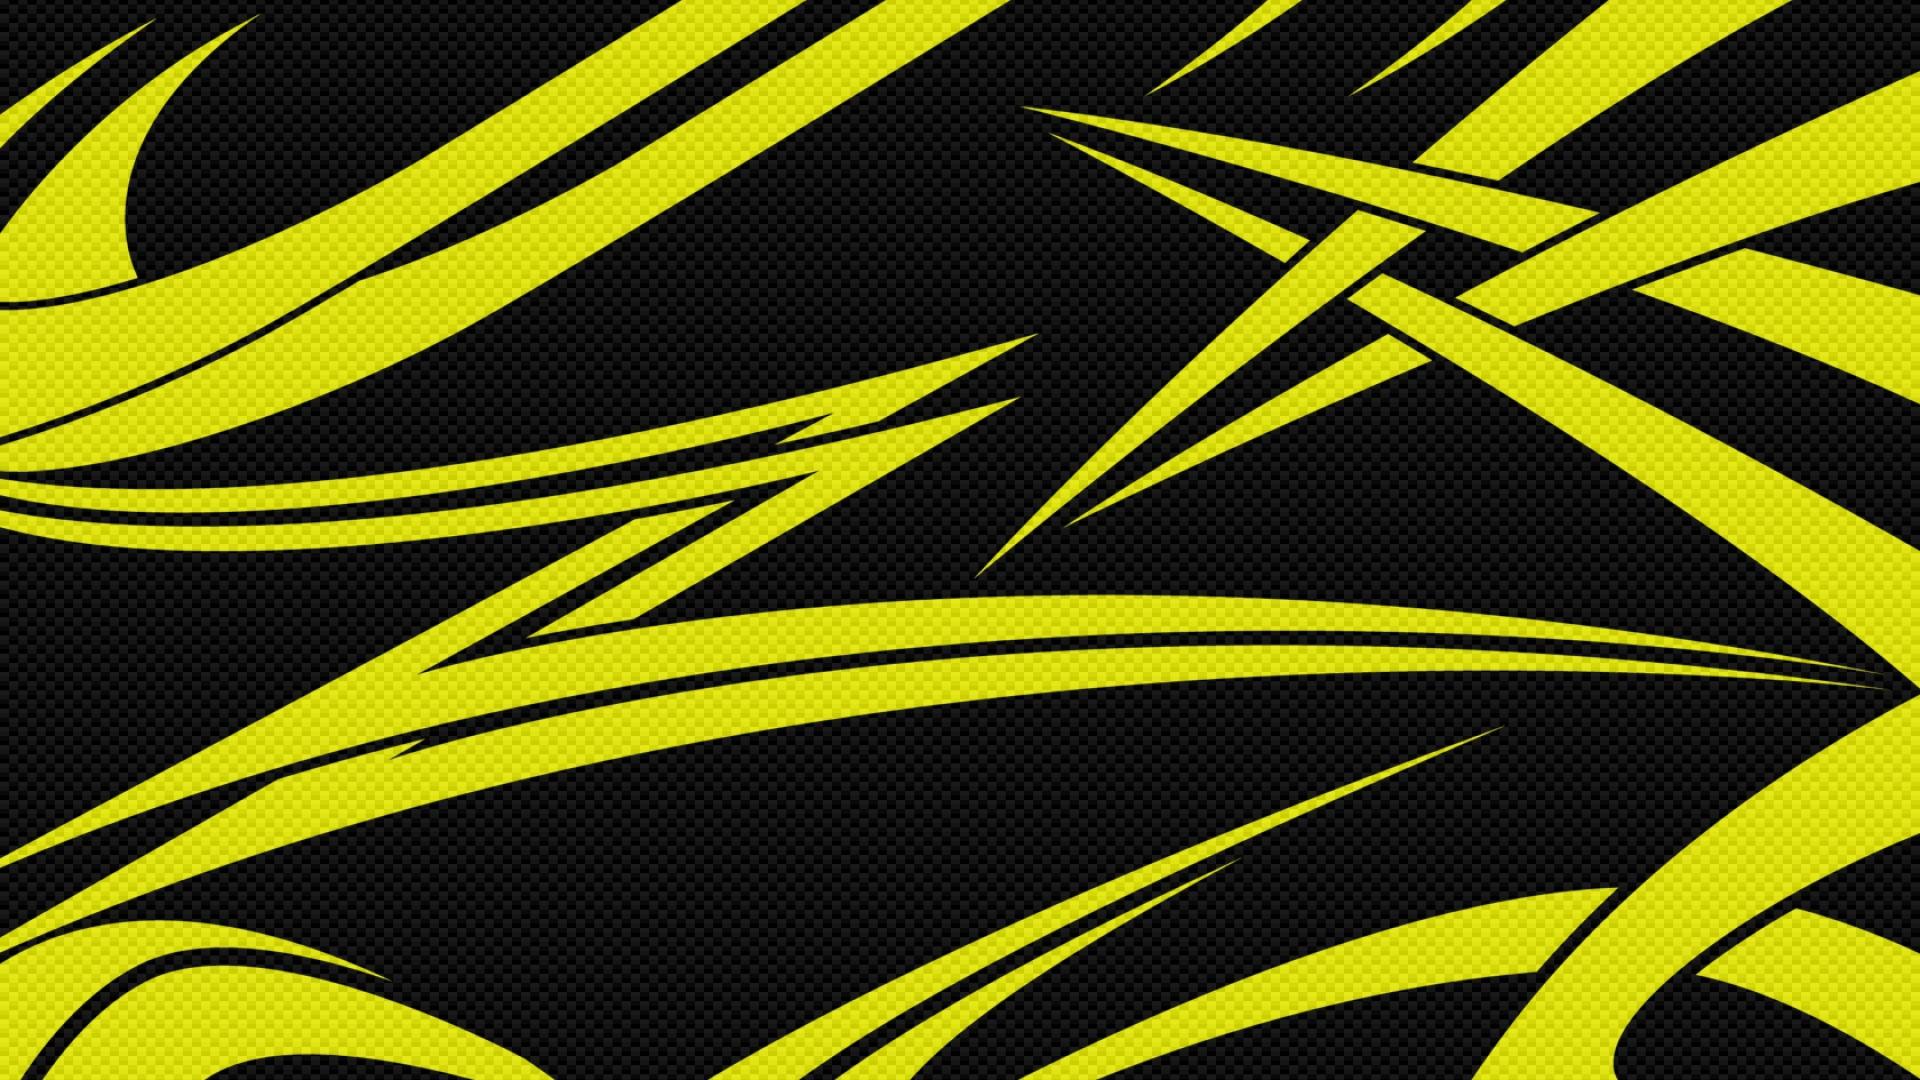 Download Wallpaper 1920x1080 Yellow Black Lines Sharp